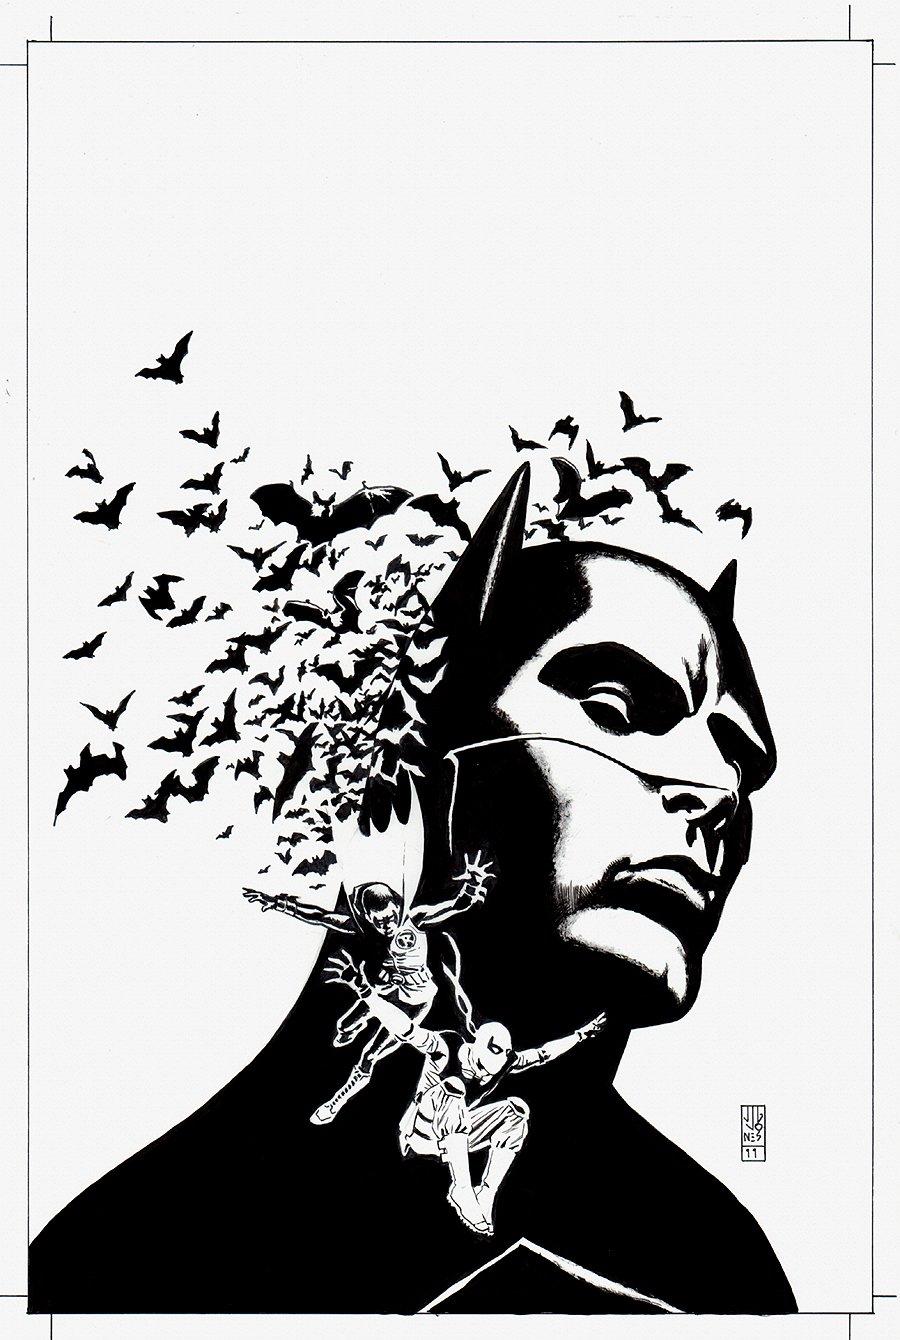 Batman and Robin #26 Cover (2011)